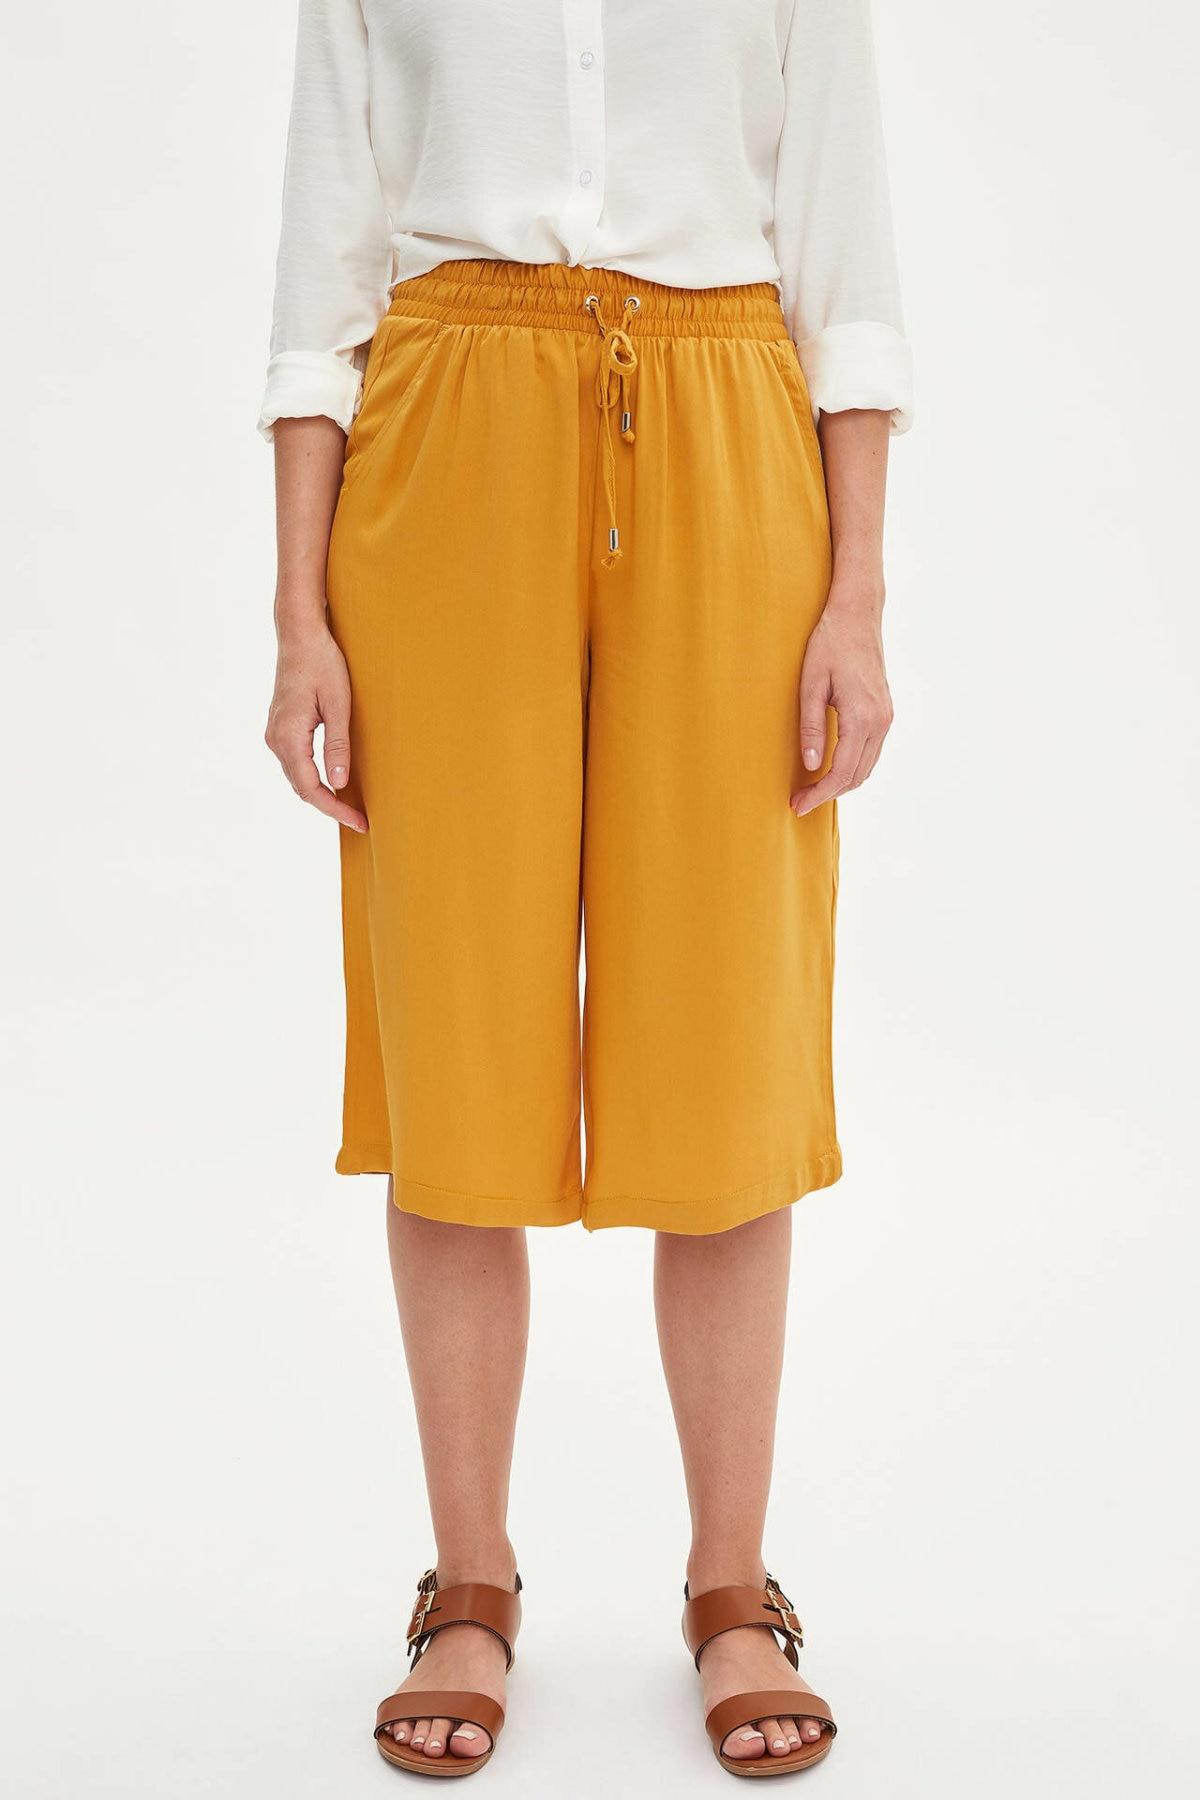 DeFacto Autumn Women Fashion Loose Trousers Female Casual Lace-up Shorts Solid Wide Leg Crop Ladies Shorts- I6798AZ19SM